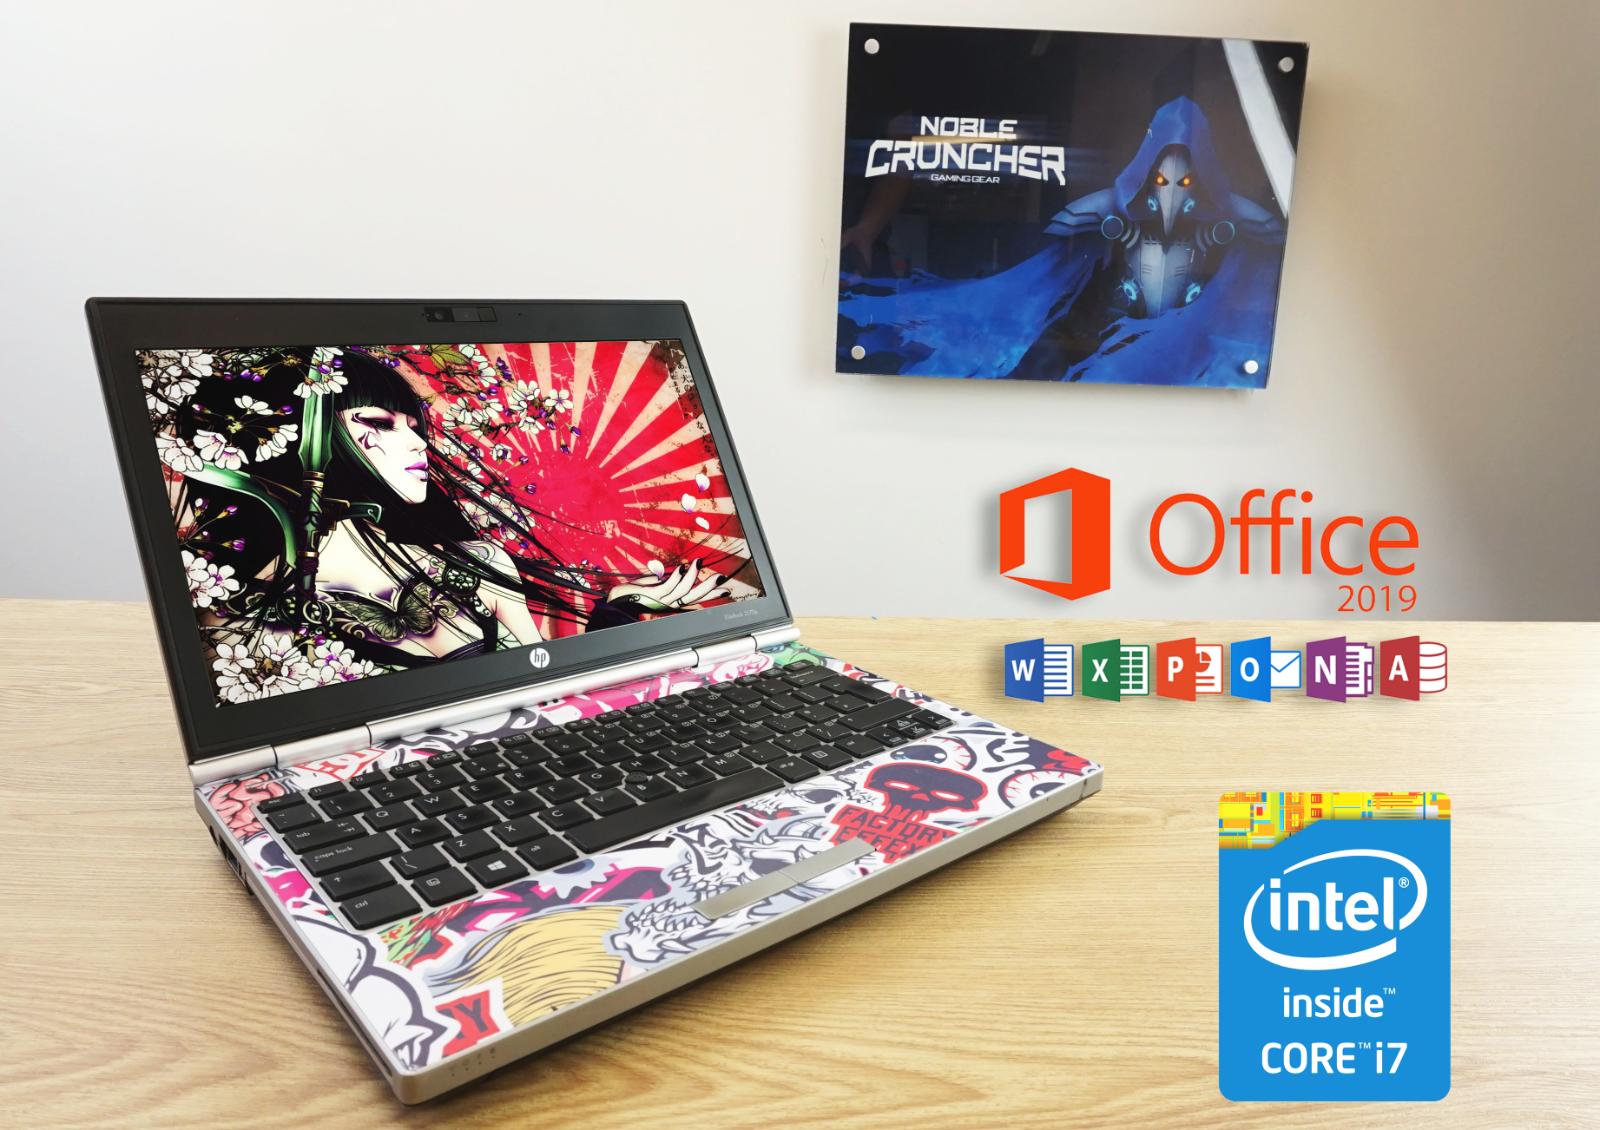 Laptop Windows - Cheap Gaming Laptop HP Intel Core i7 6GB RAM 180GB SSD Windows 10 Computer